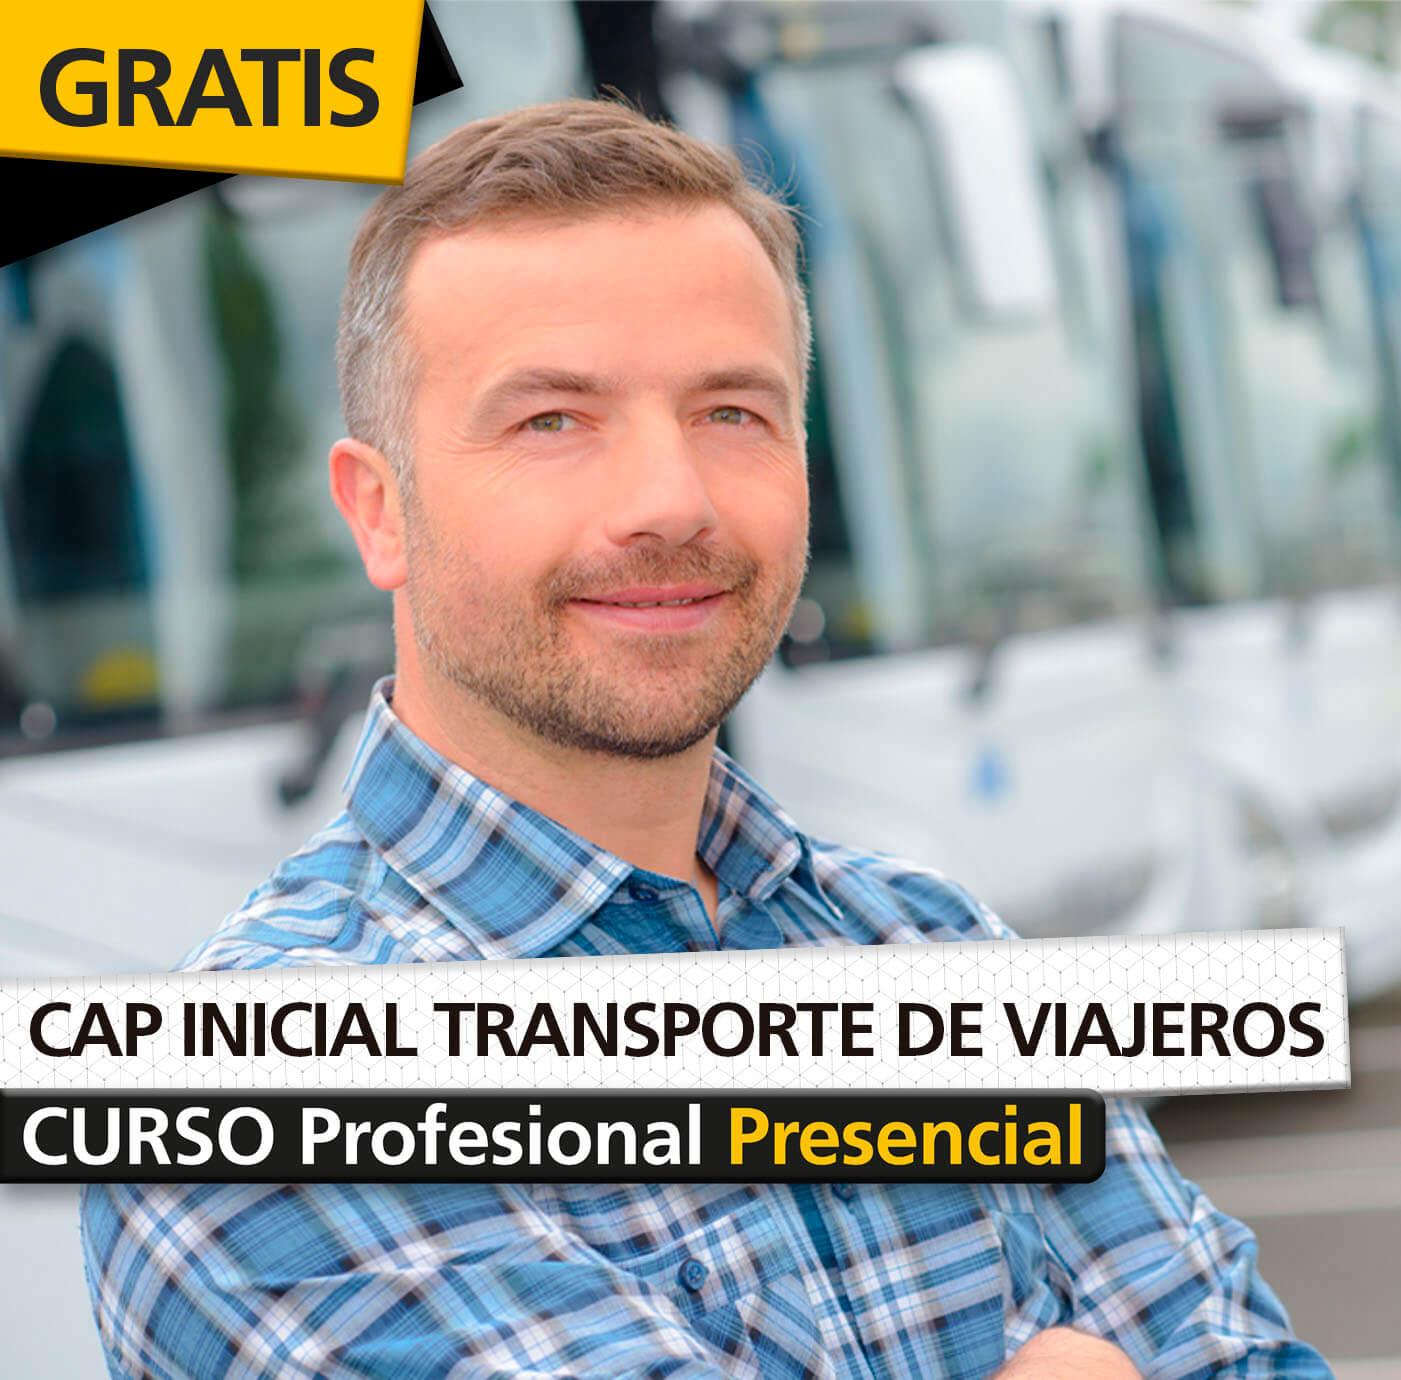 C-CAP-inicial-viajeros-SliderSlider_Cuadrado_movil